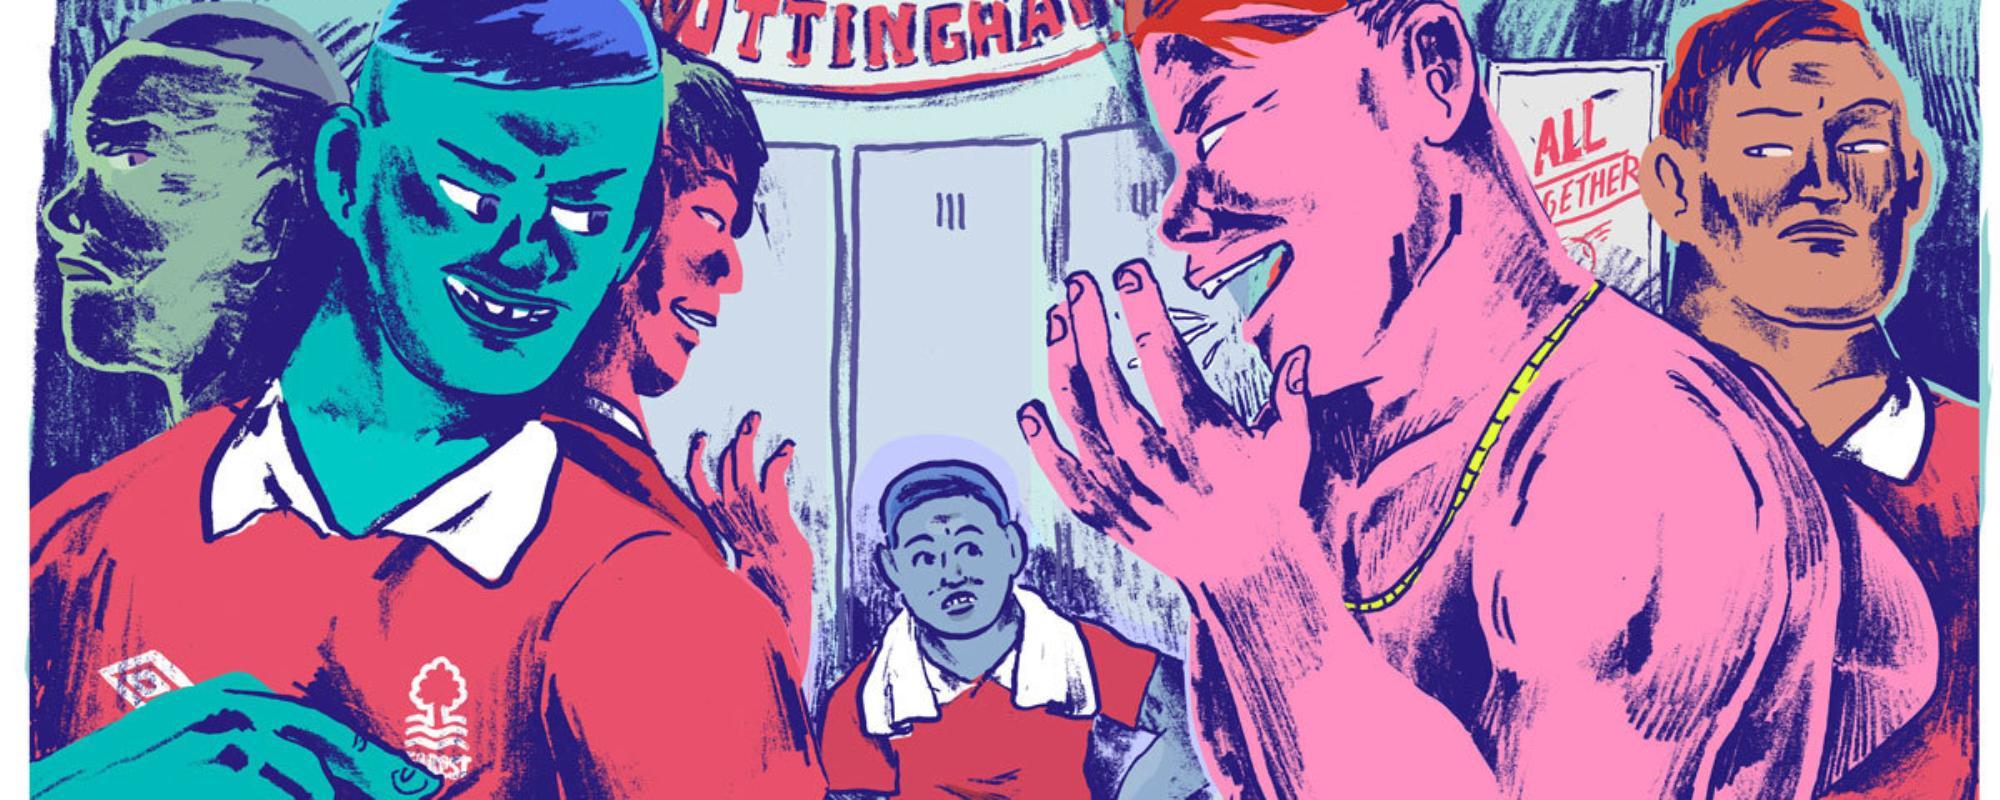 homosexualit-dans-le-football-franais-la-loi-du-silence-1466064908